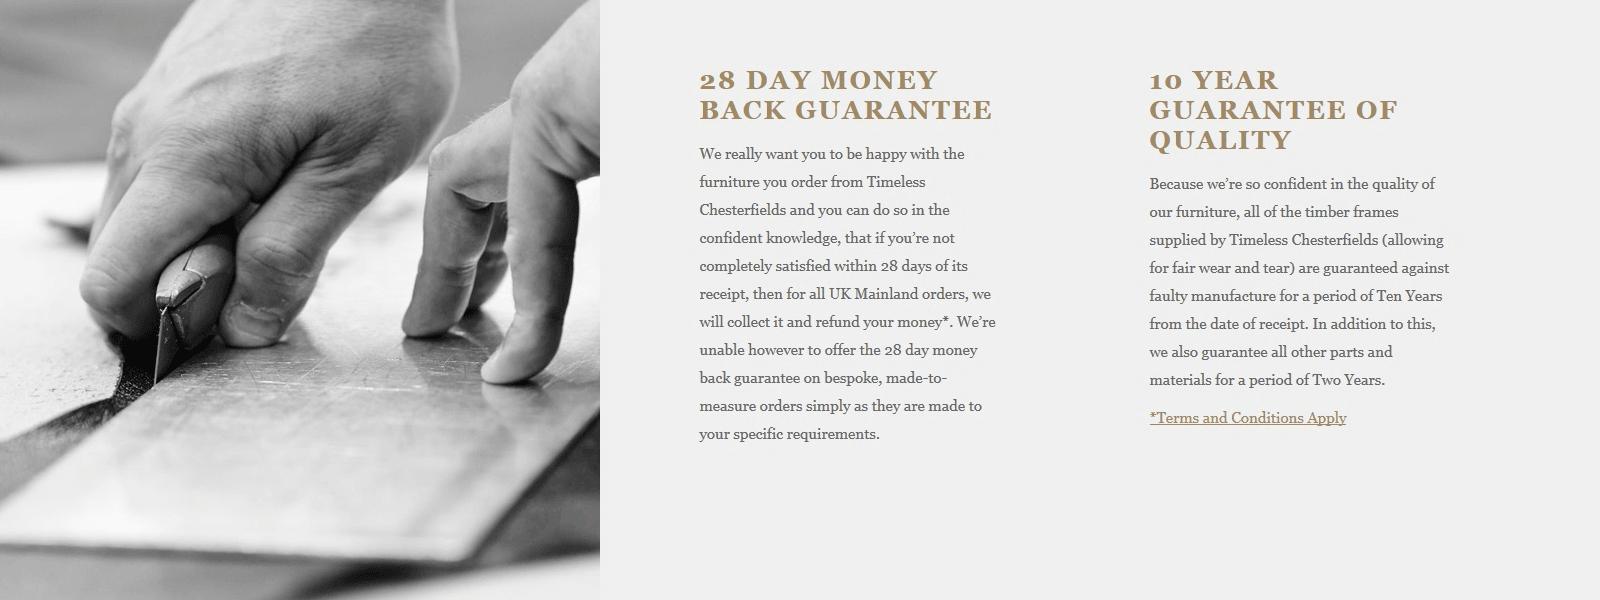 28 Day Mone Back Guarantee